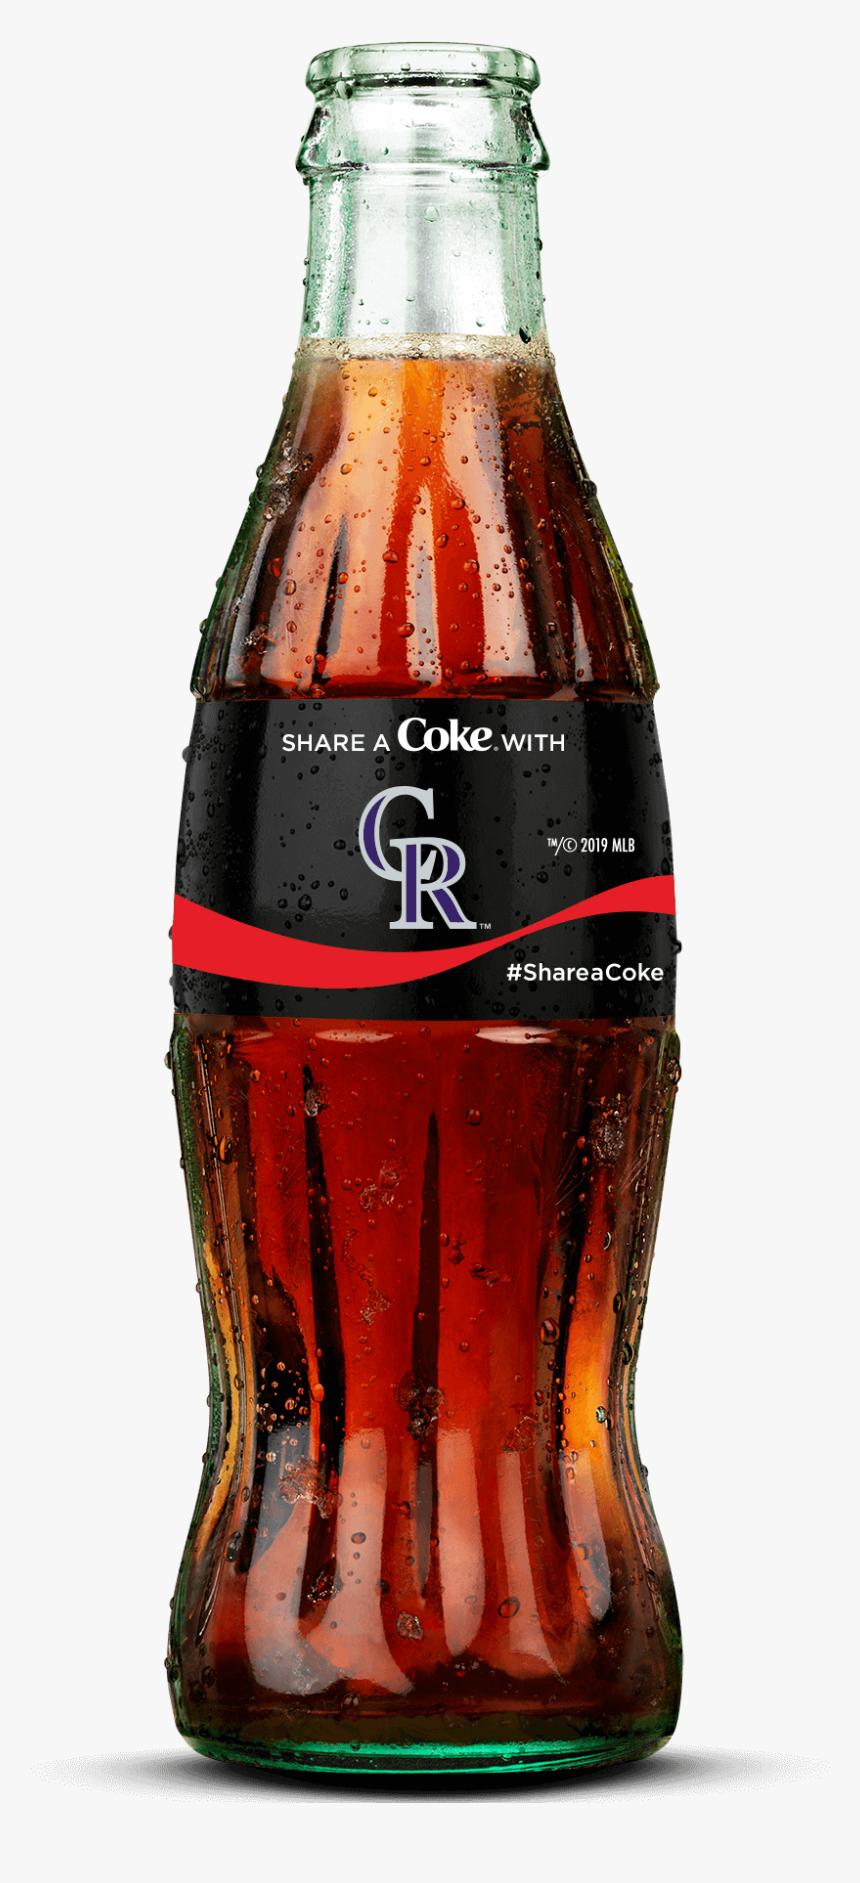 Colorado Rockies Brand Bottle - Overwatch Coca Cola Bottles, HD Png Download, Free Download